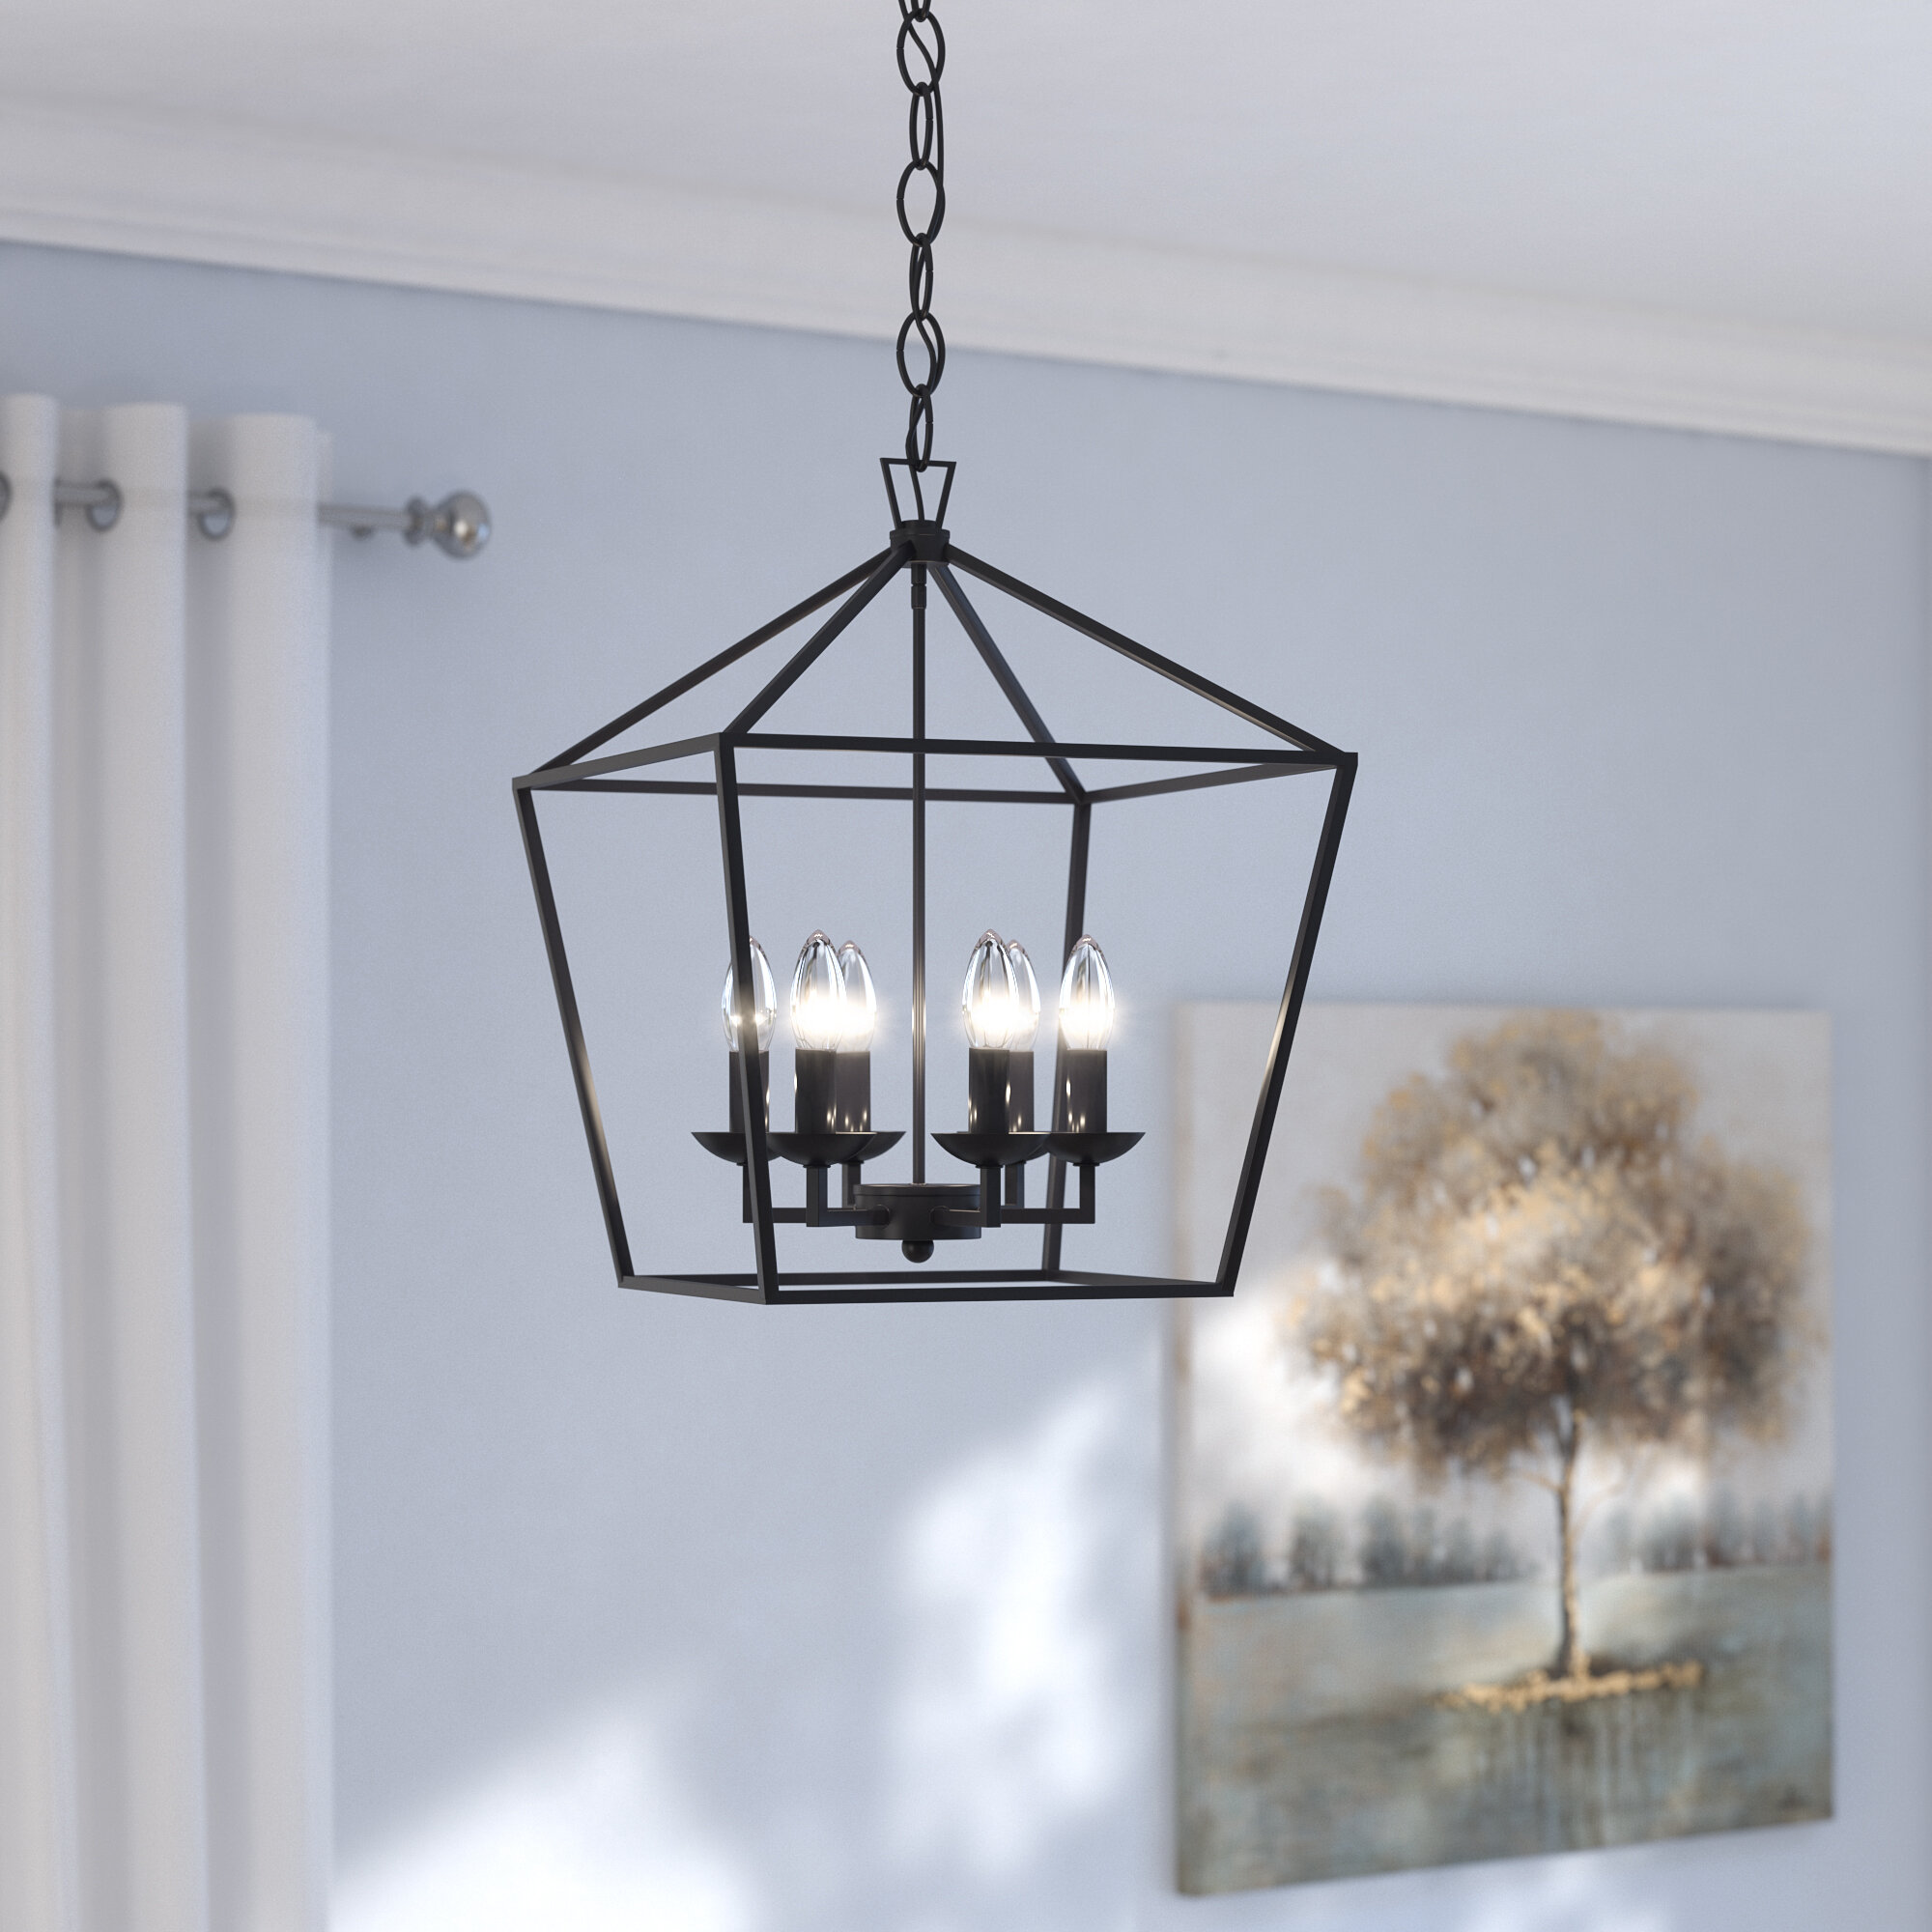 Wayfair laurel foundry modern farmhouse carmen 6 light foyer pendant